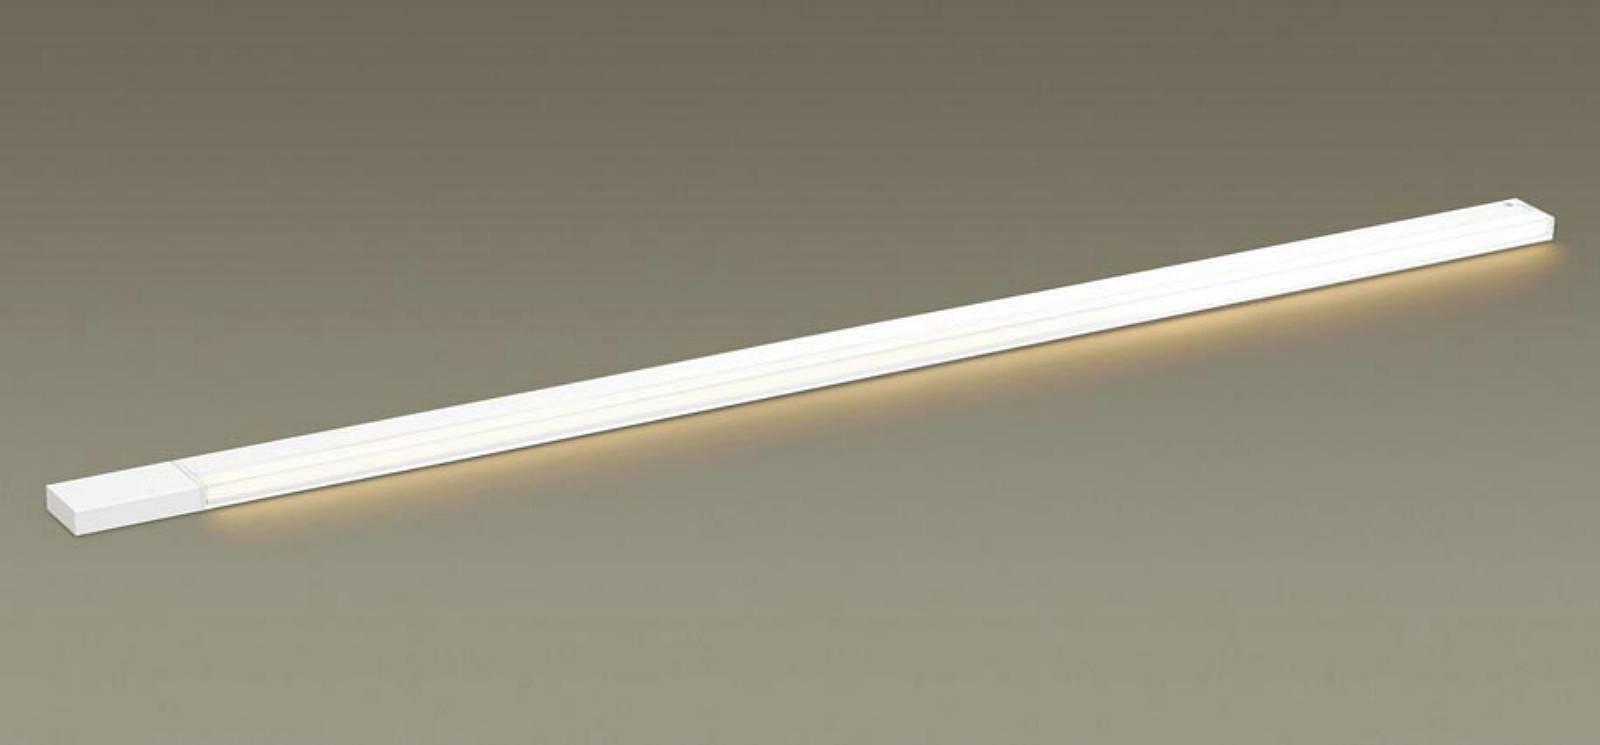 T区分 パナソニック LGB50838LE1 ベースライト 建築化照明器具 畳数設定無し LED【setsuden_led】